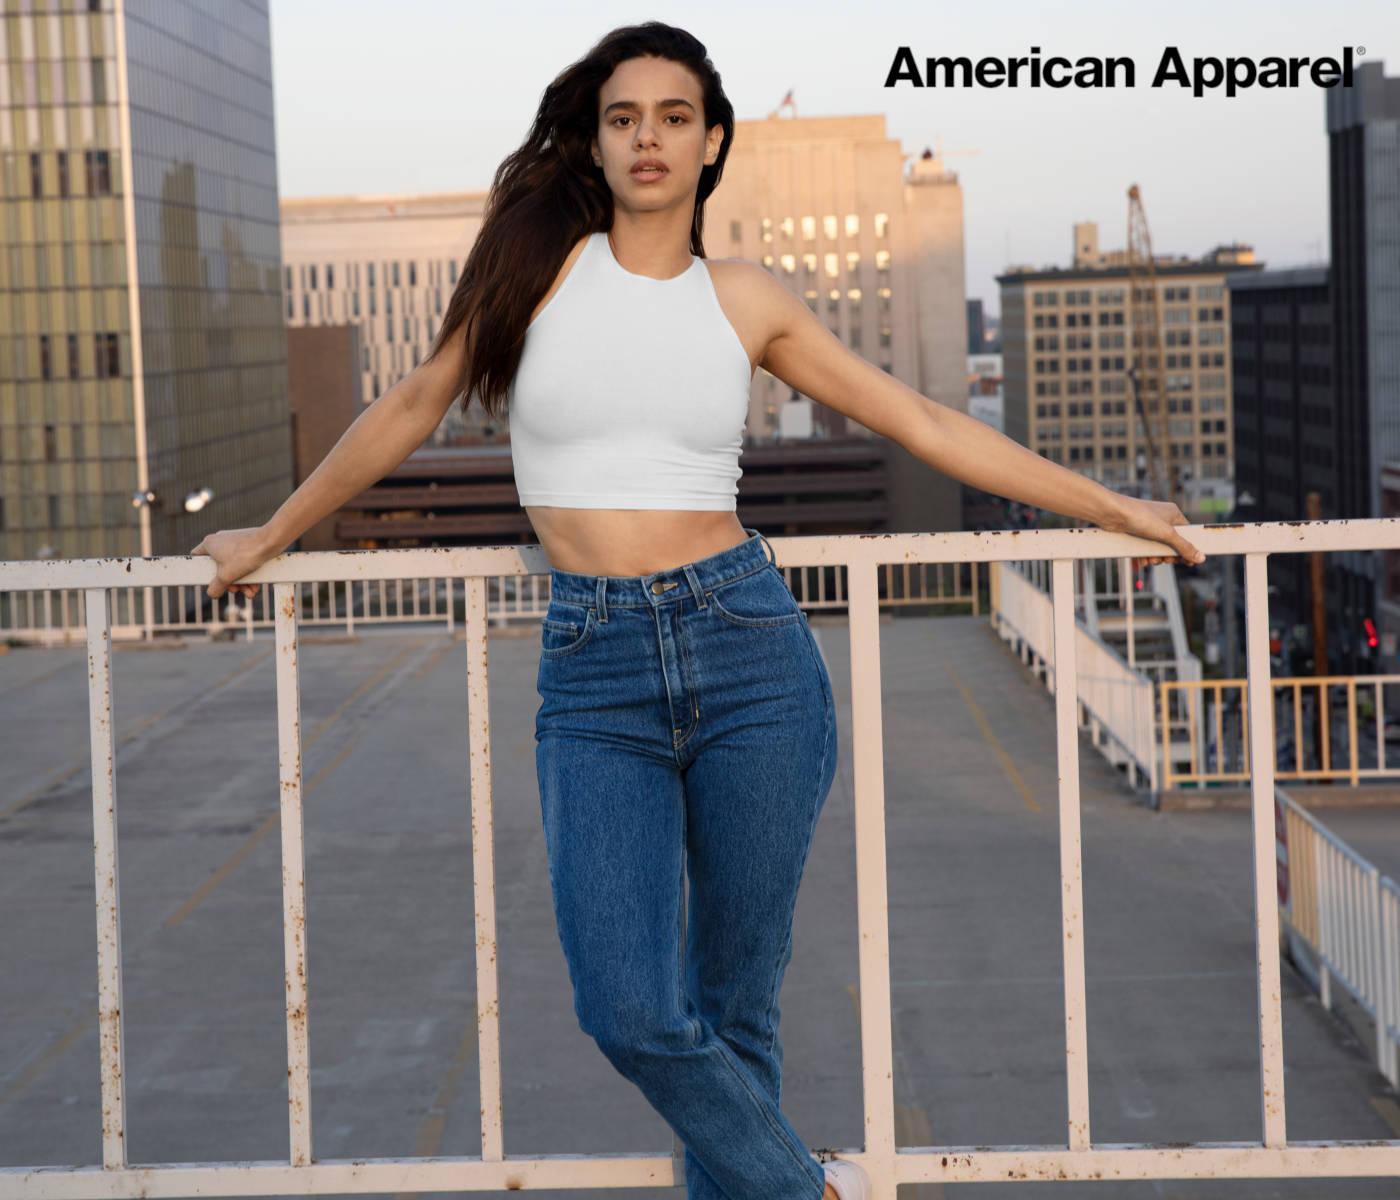 852bb01b87 American Apparel | Brands